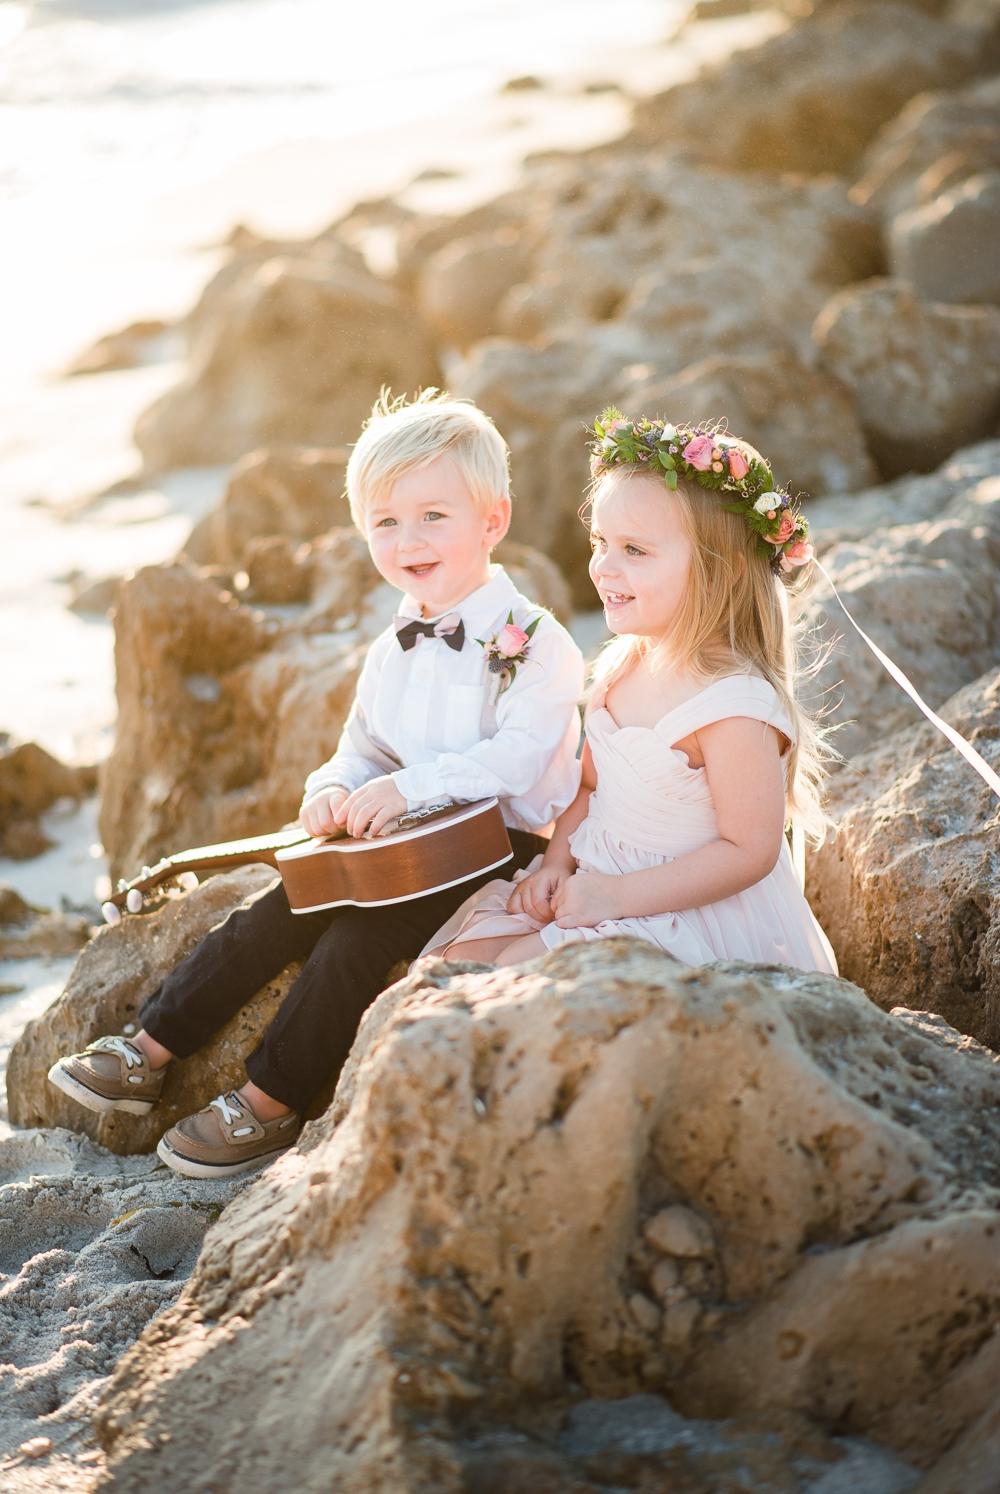 2016 HLM Wedding Beach Shoot 15.jpg